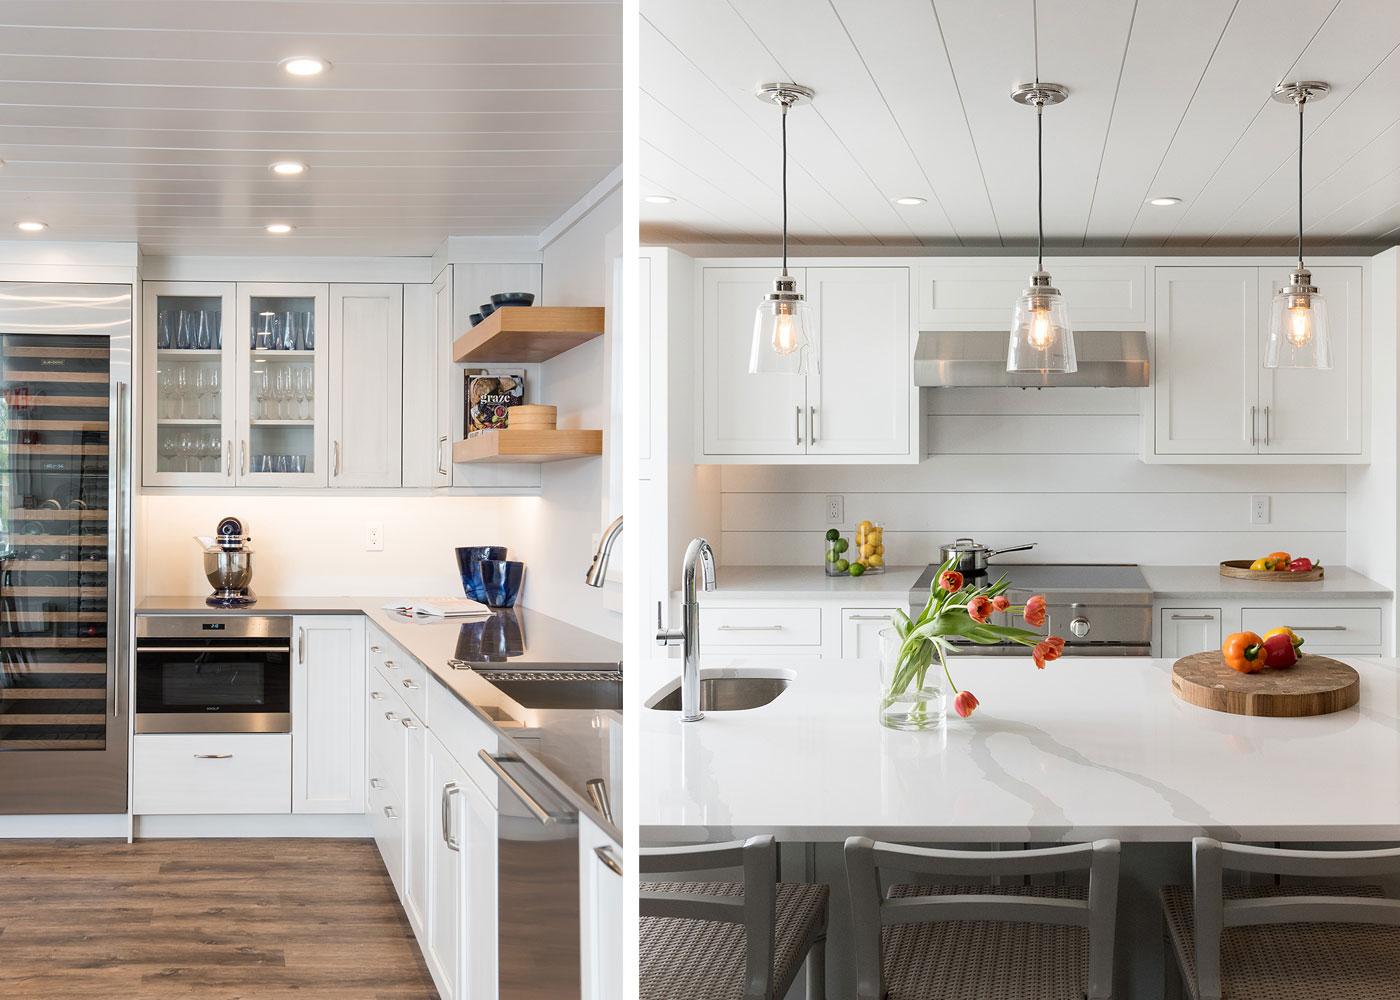 kitchen and bar set up at Marine Home Center